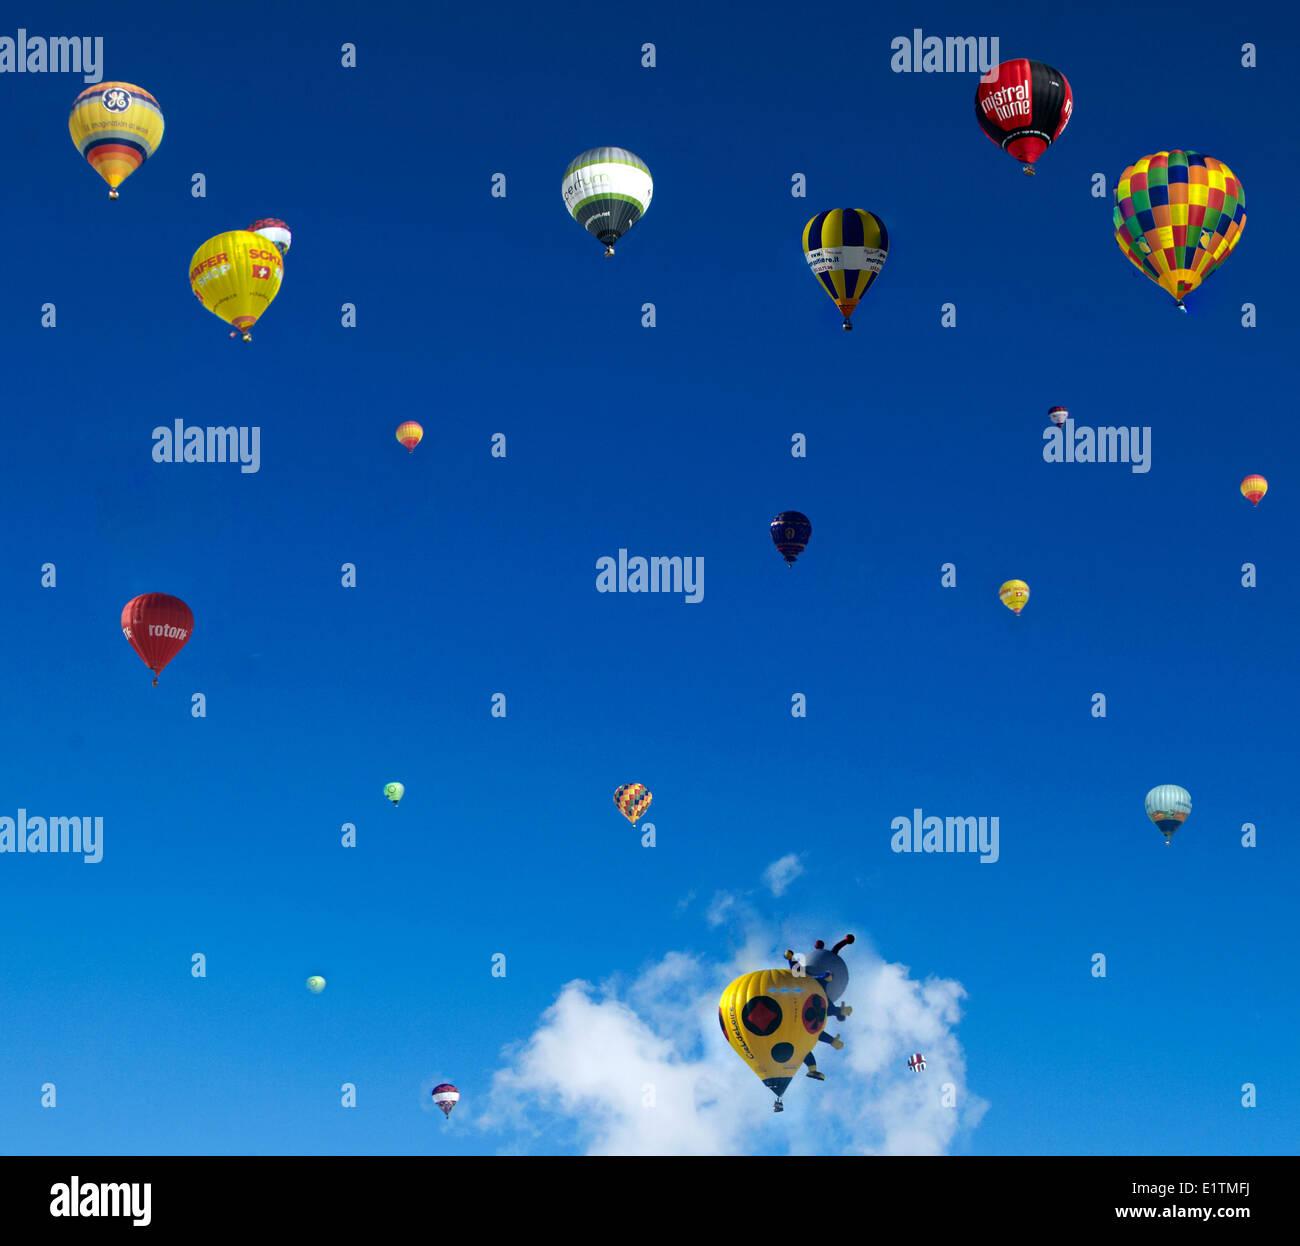 Europe, Switzerland, Vaud Canton, Chateau d'Oex city, Hot Air Balloon International Festival Stock Photo